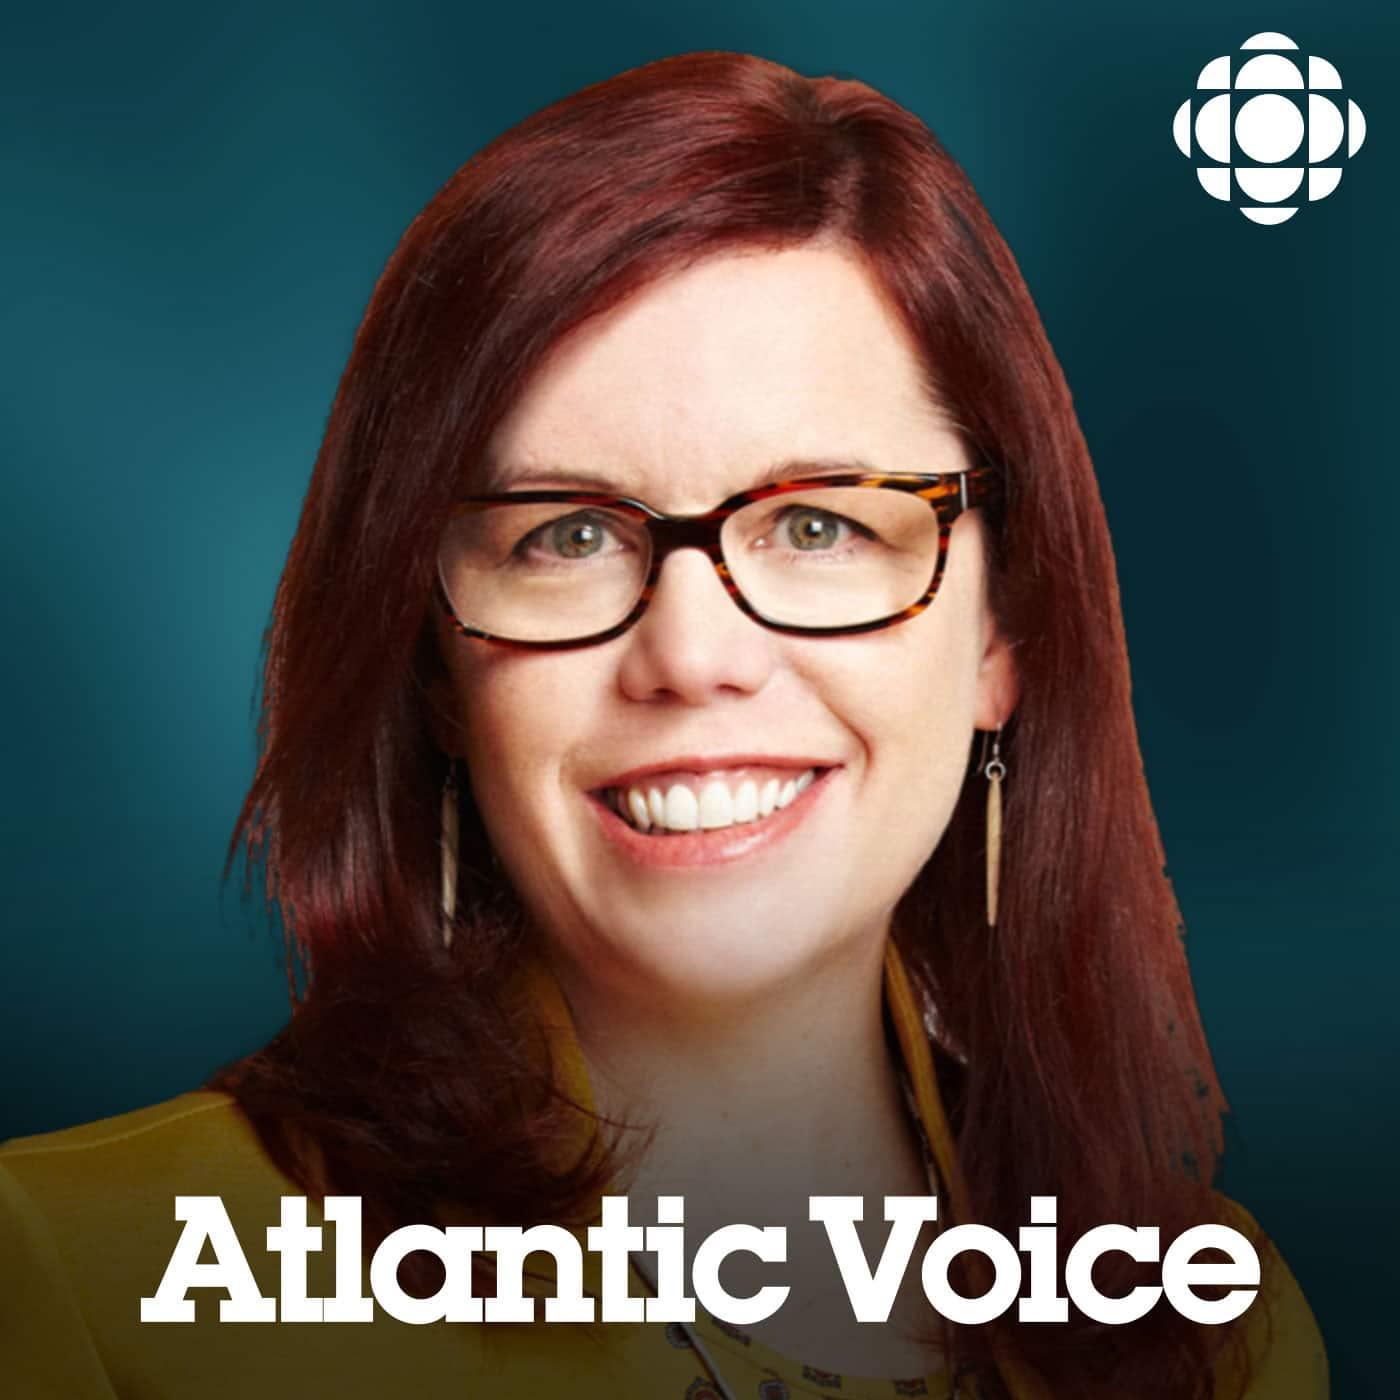 Atlantic Voice